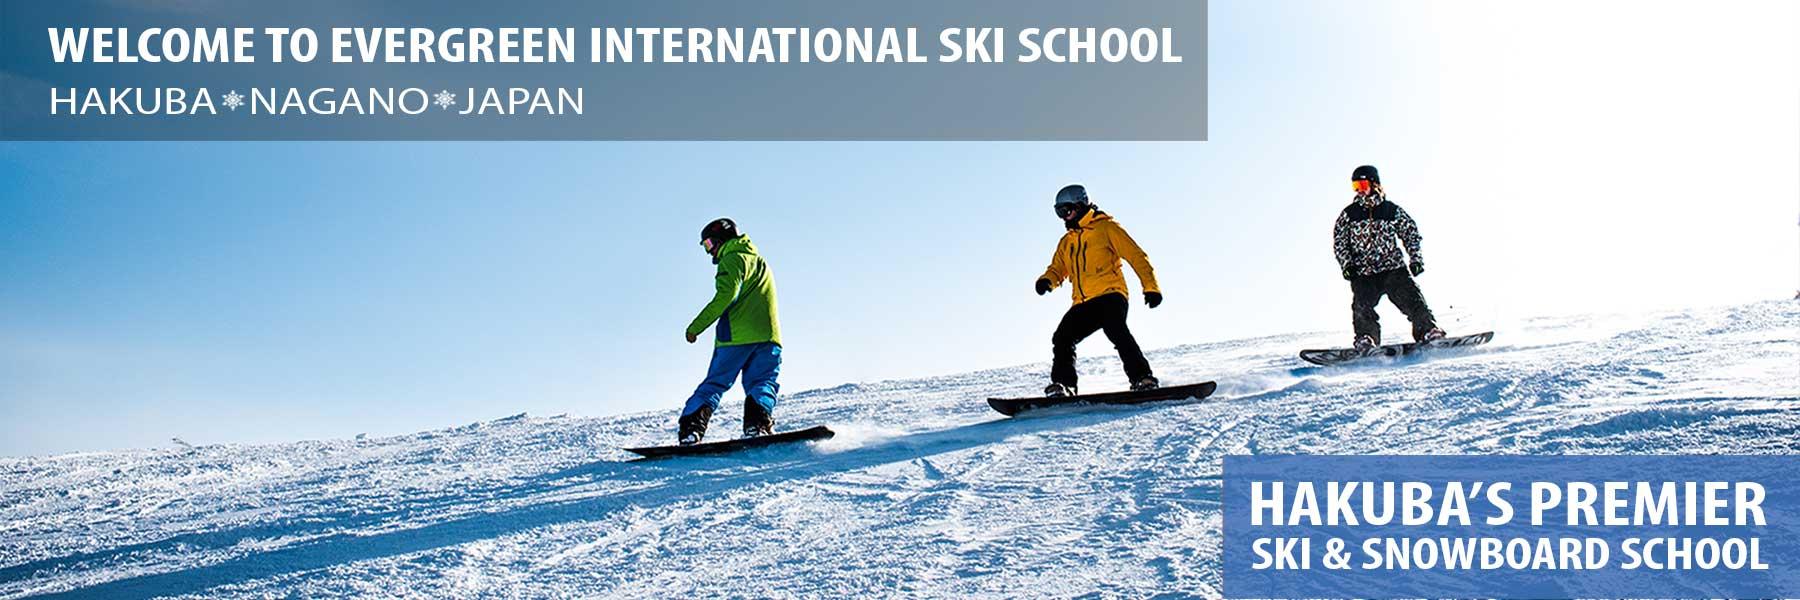 hakuba ski school header - snowboard lessons